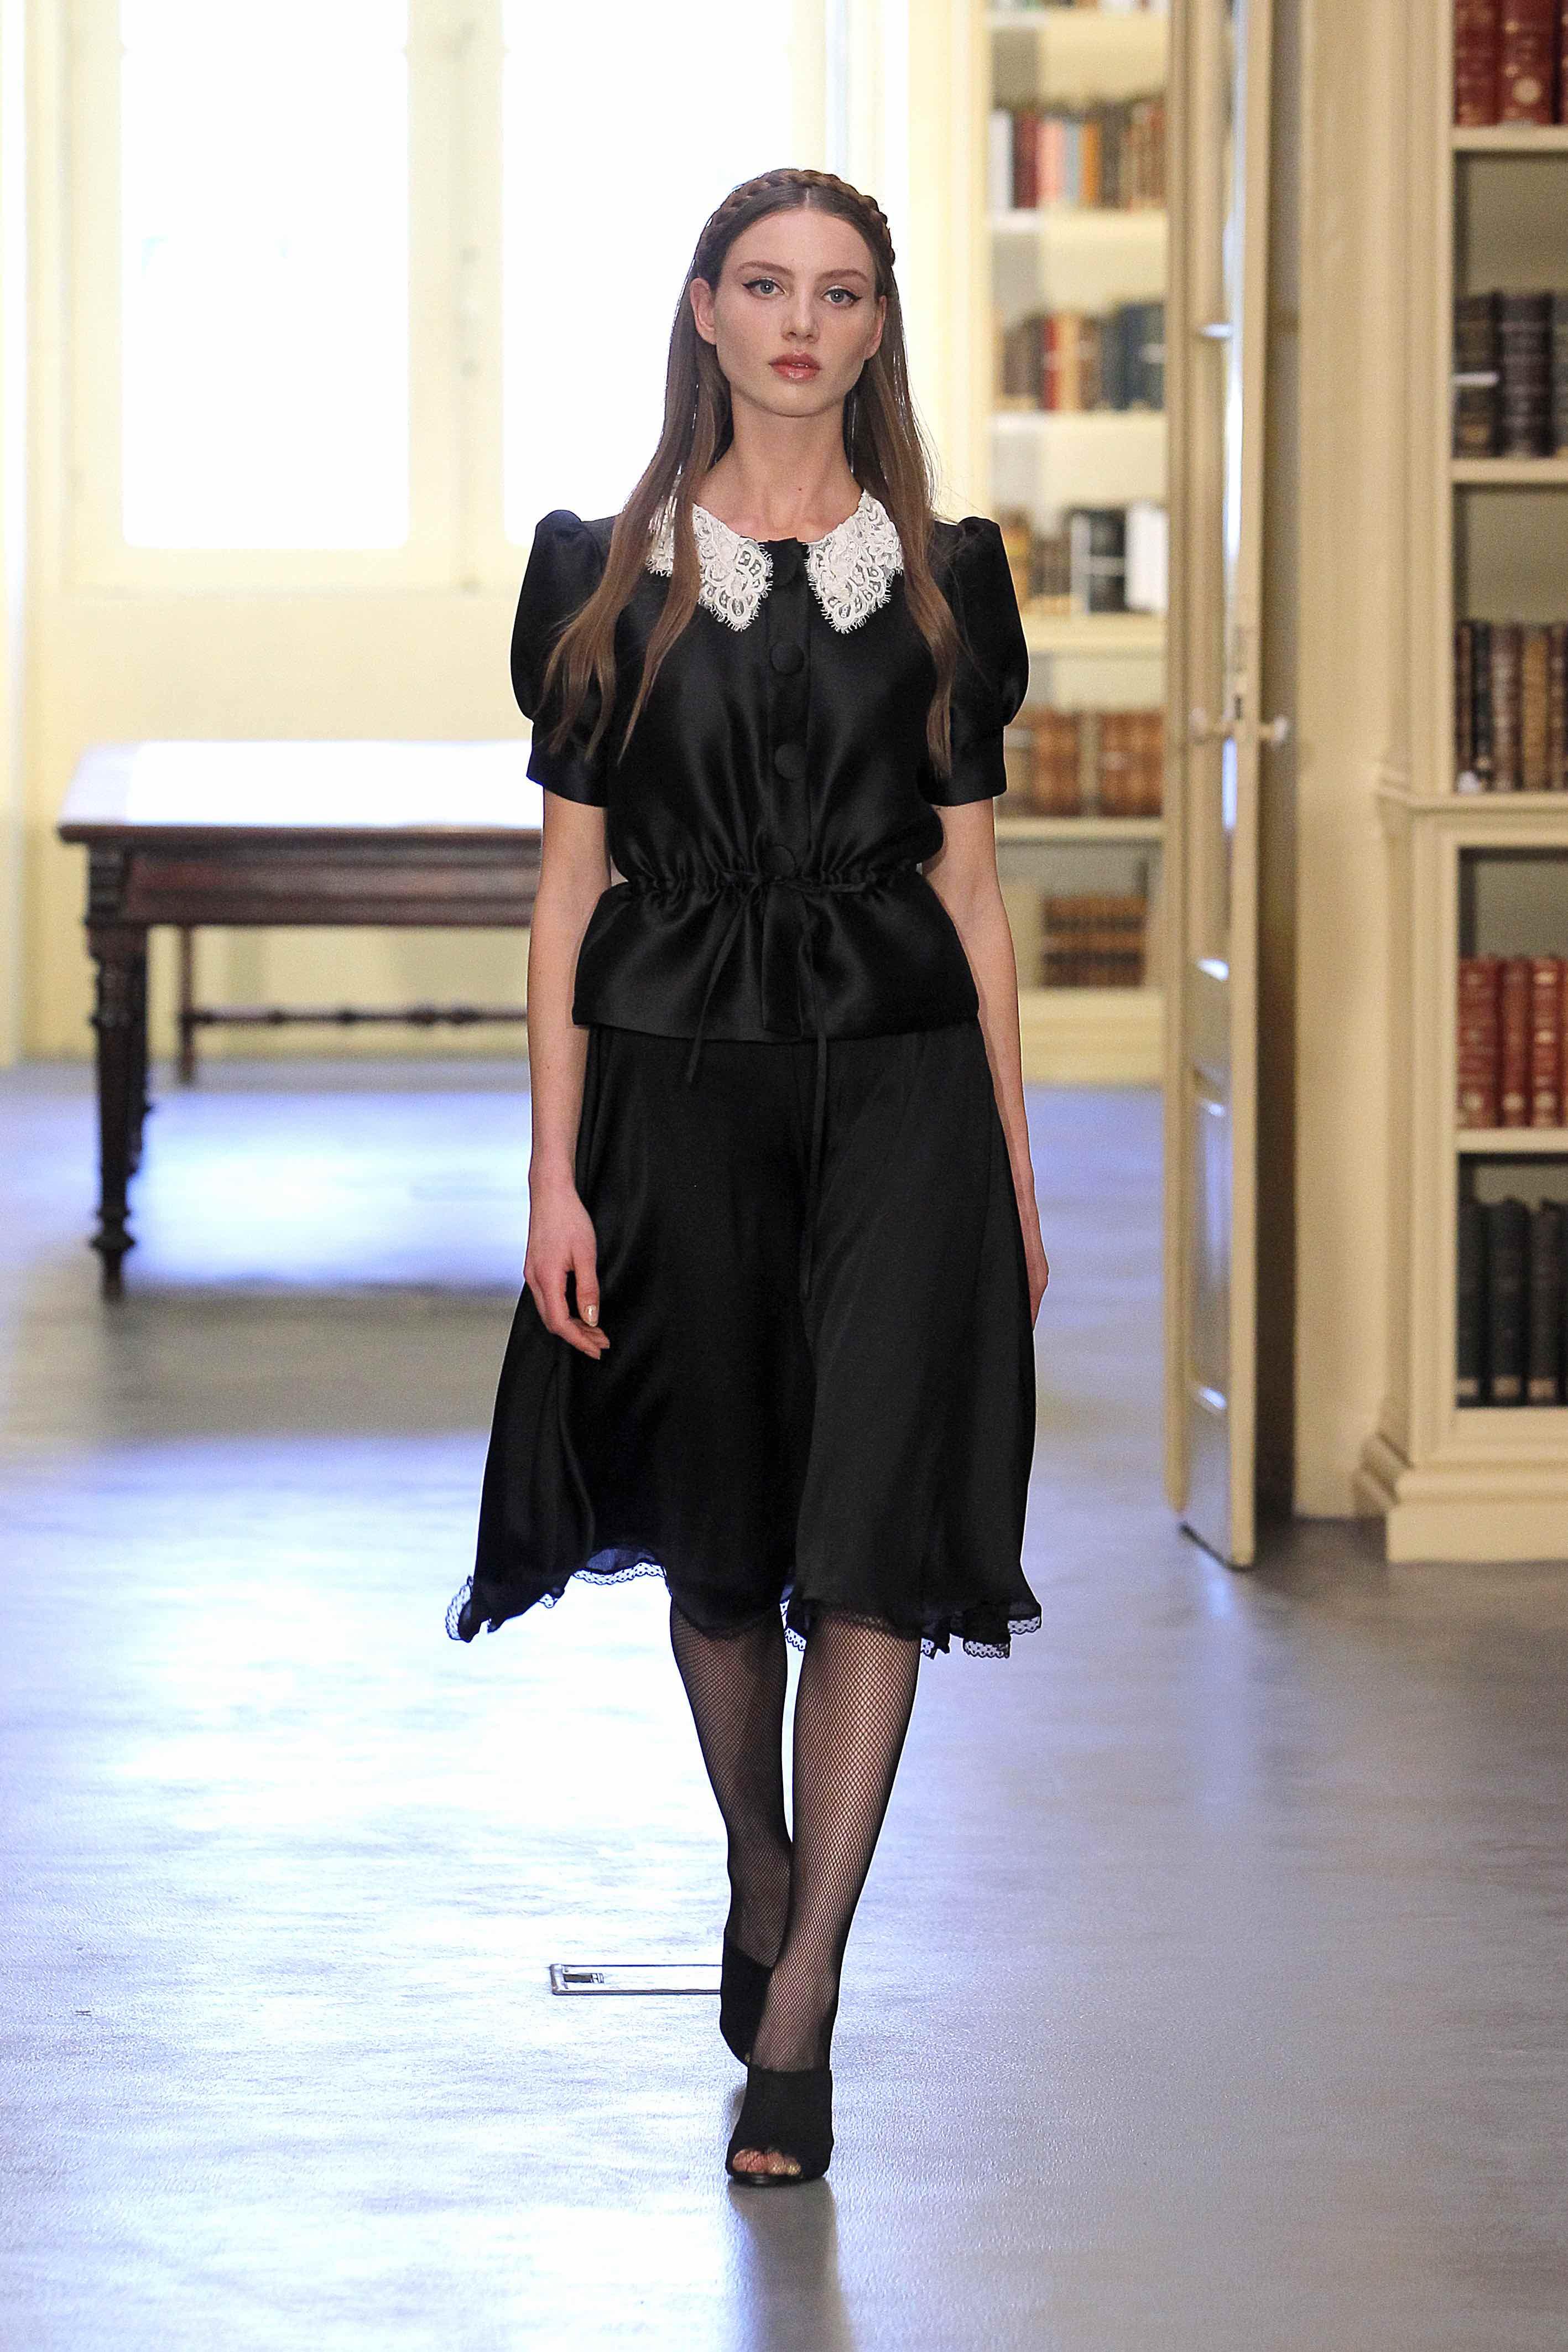 Portugal Fashion #SofaEdition 8